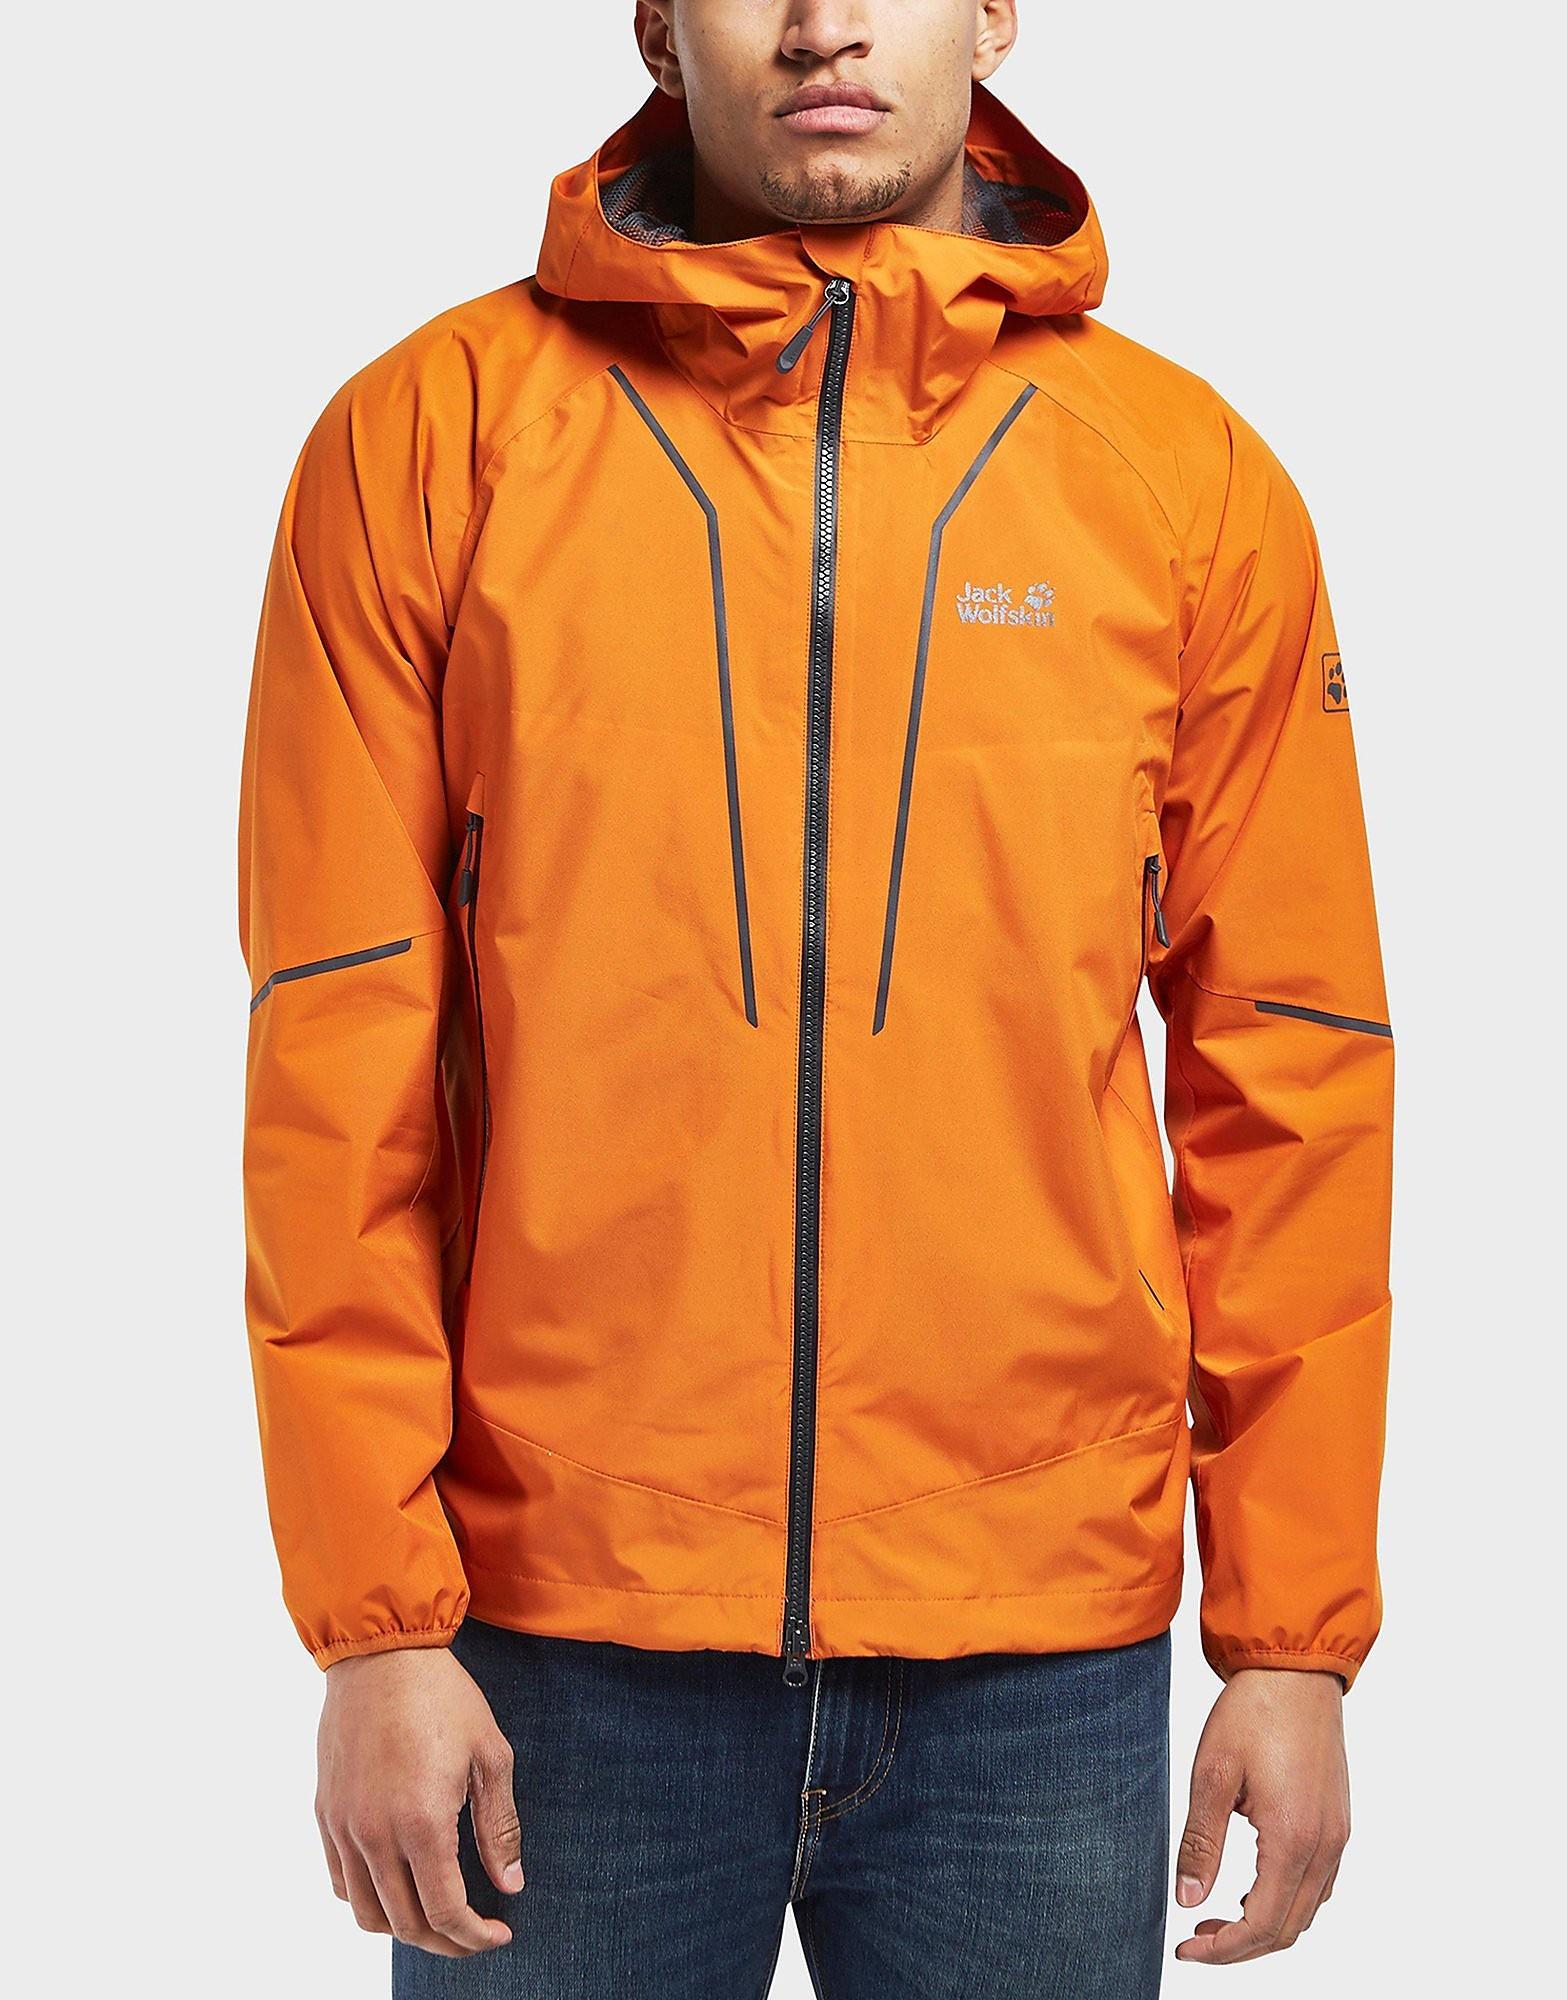 Jack Wolfskin Sierra Trail Lightweight Jacket